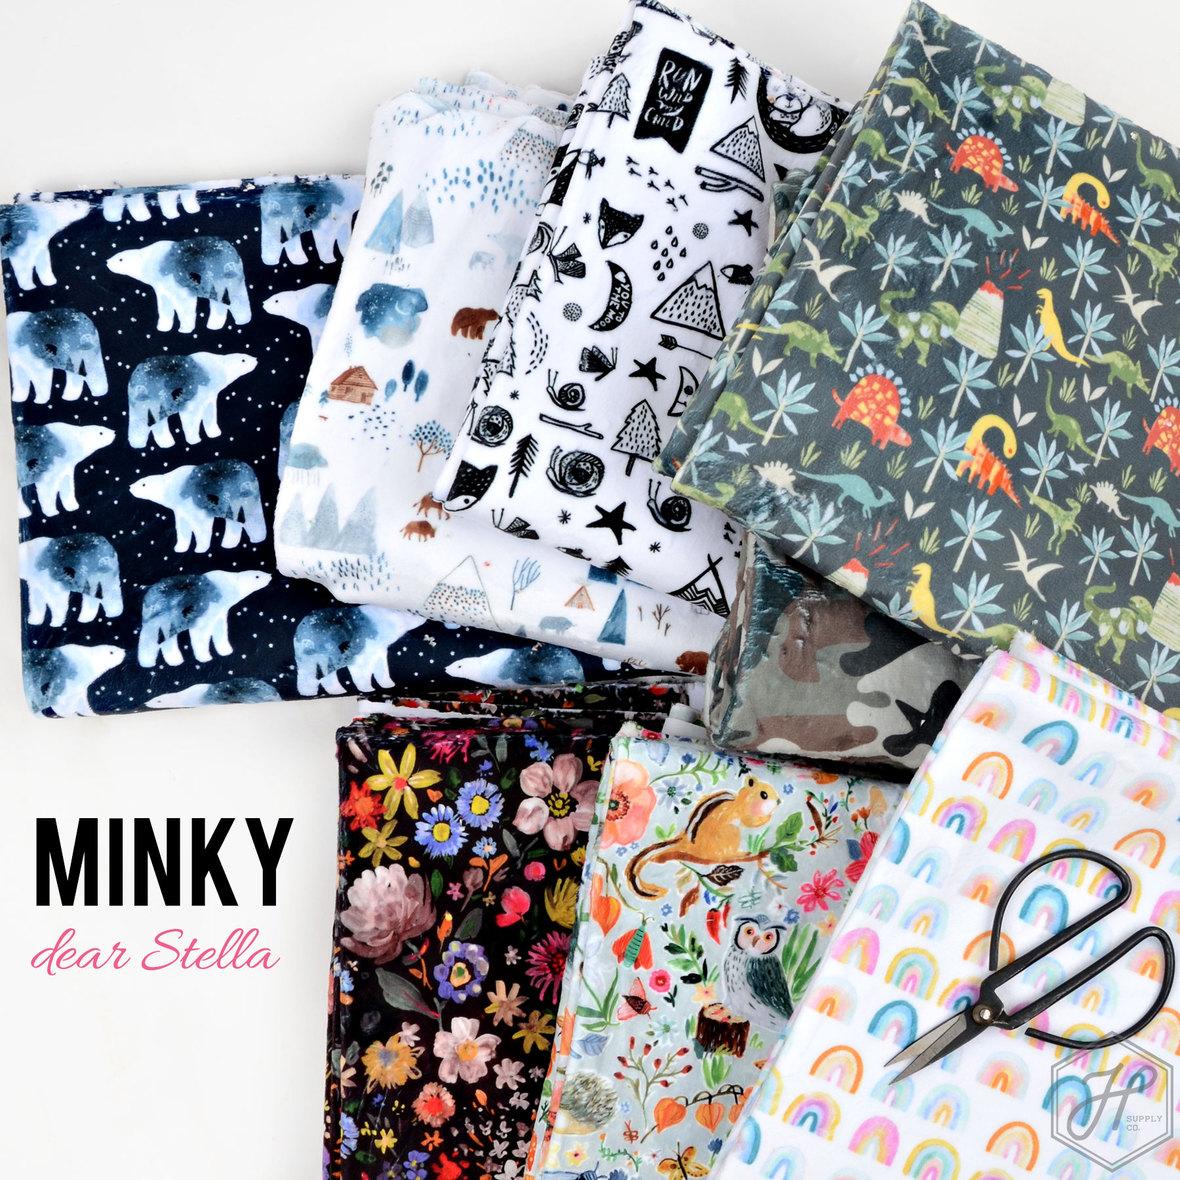 Printed-Minky-by-Dear-Stella-at-Hawthorne-Supply-Co